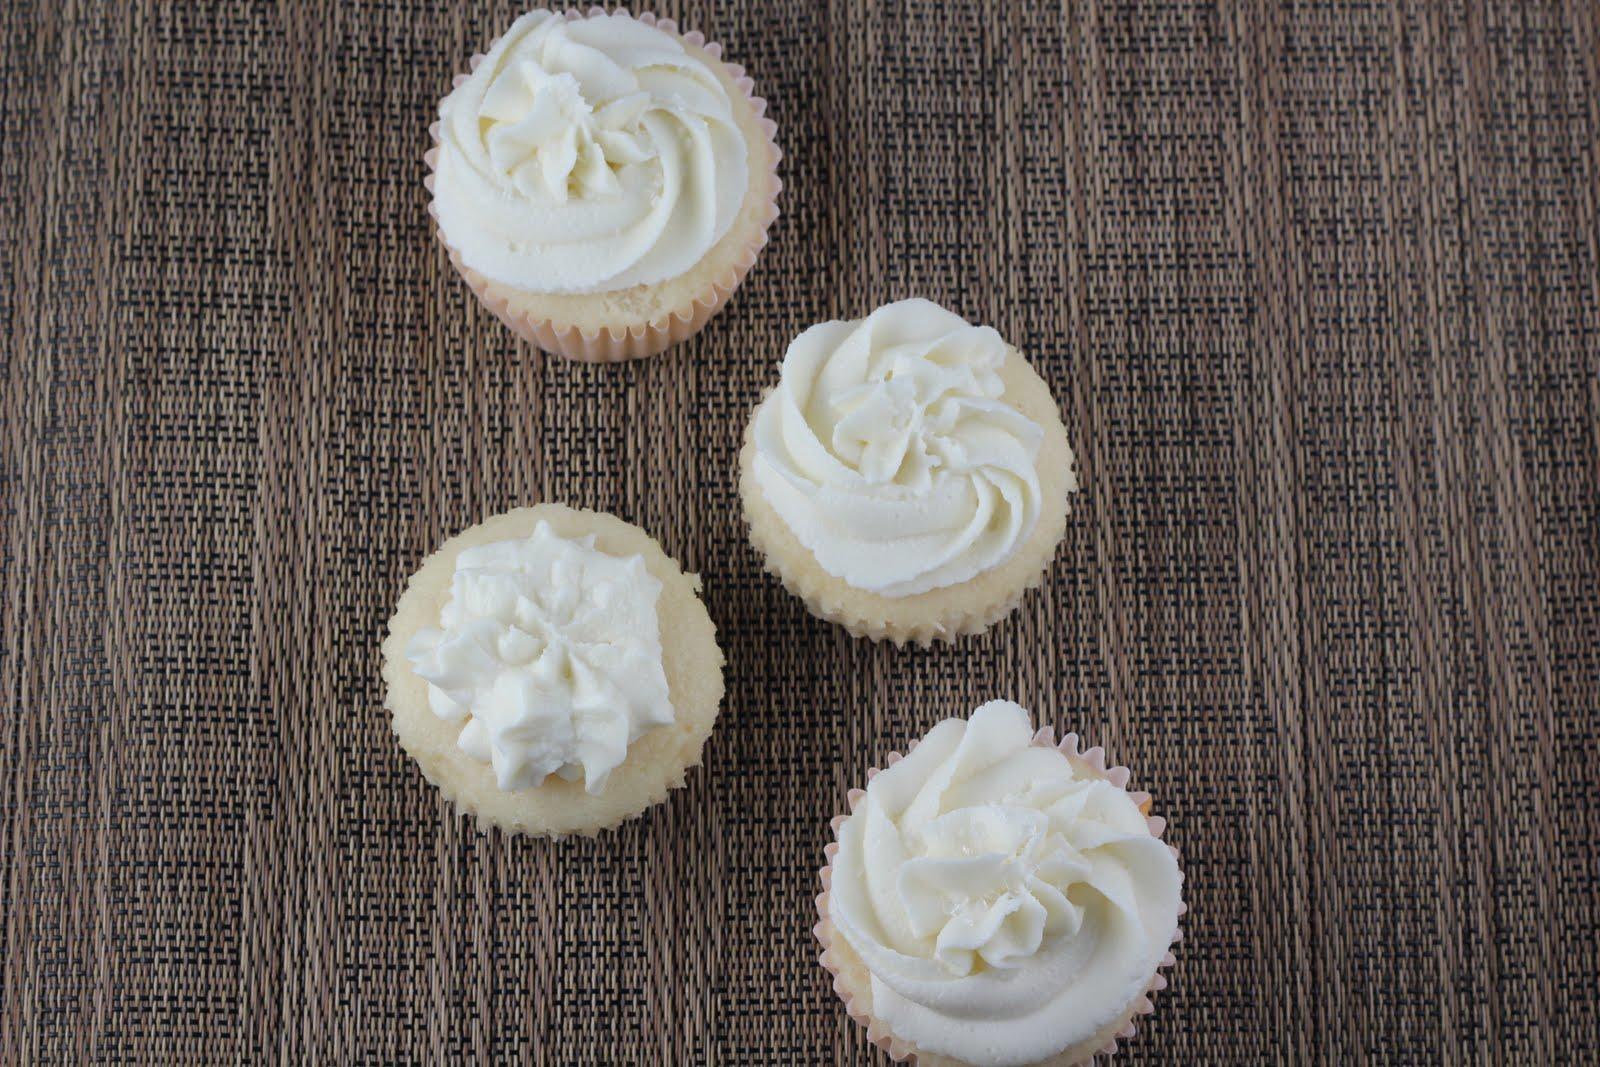 White Wedding Cake Cupcakes A Zesty Bite